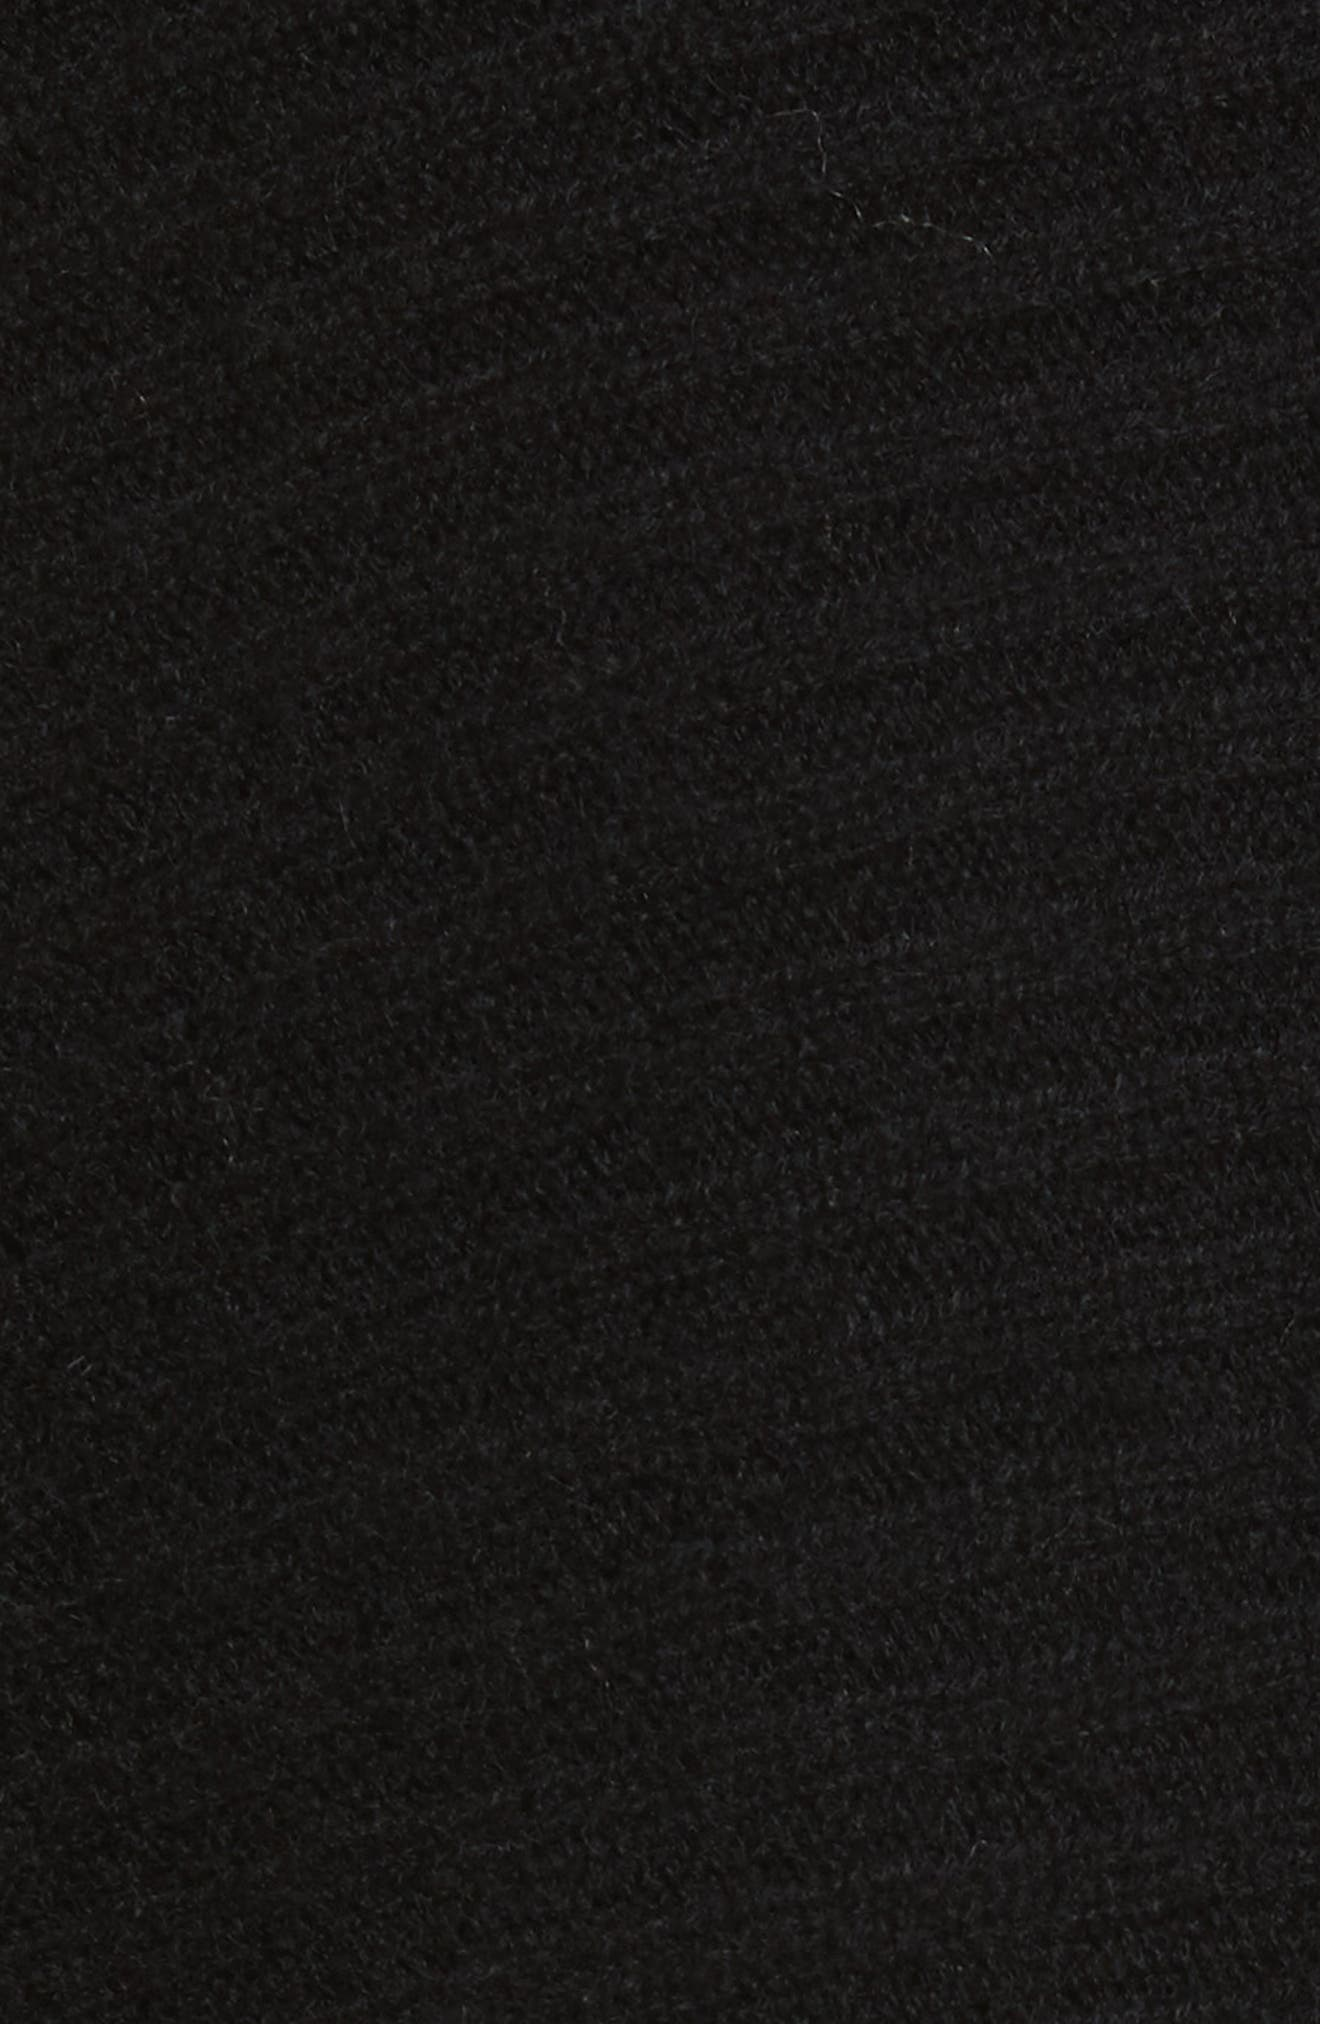 Wool Blend Raglan V-Neck Sweater,                             Alternate thumbnail 13, color,